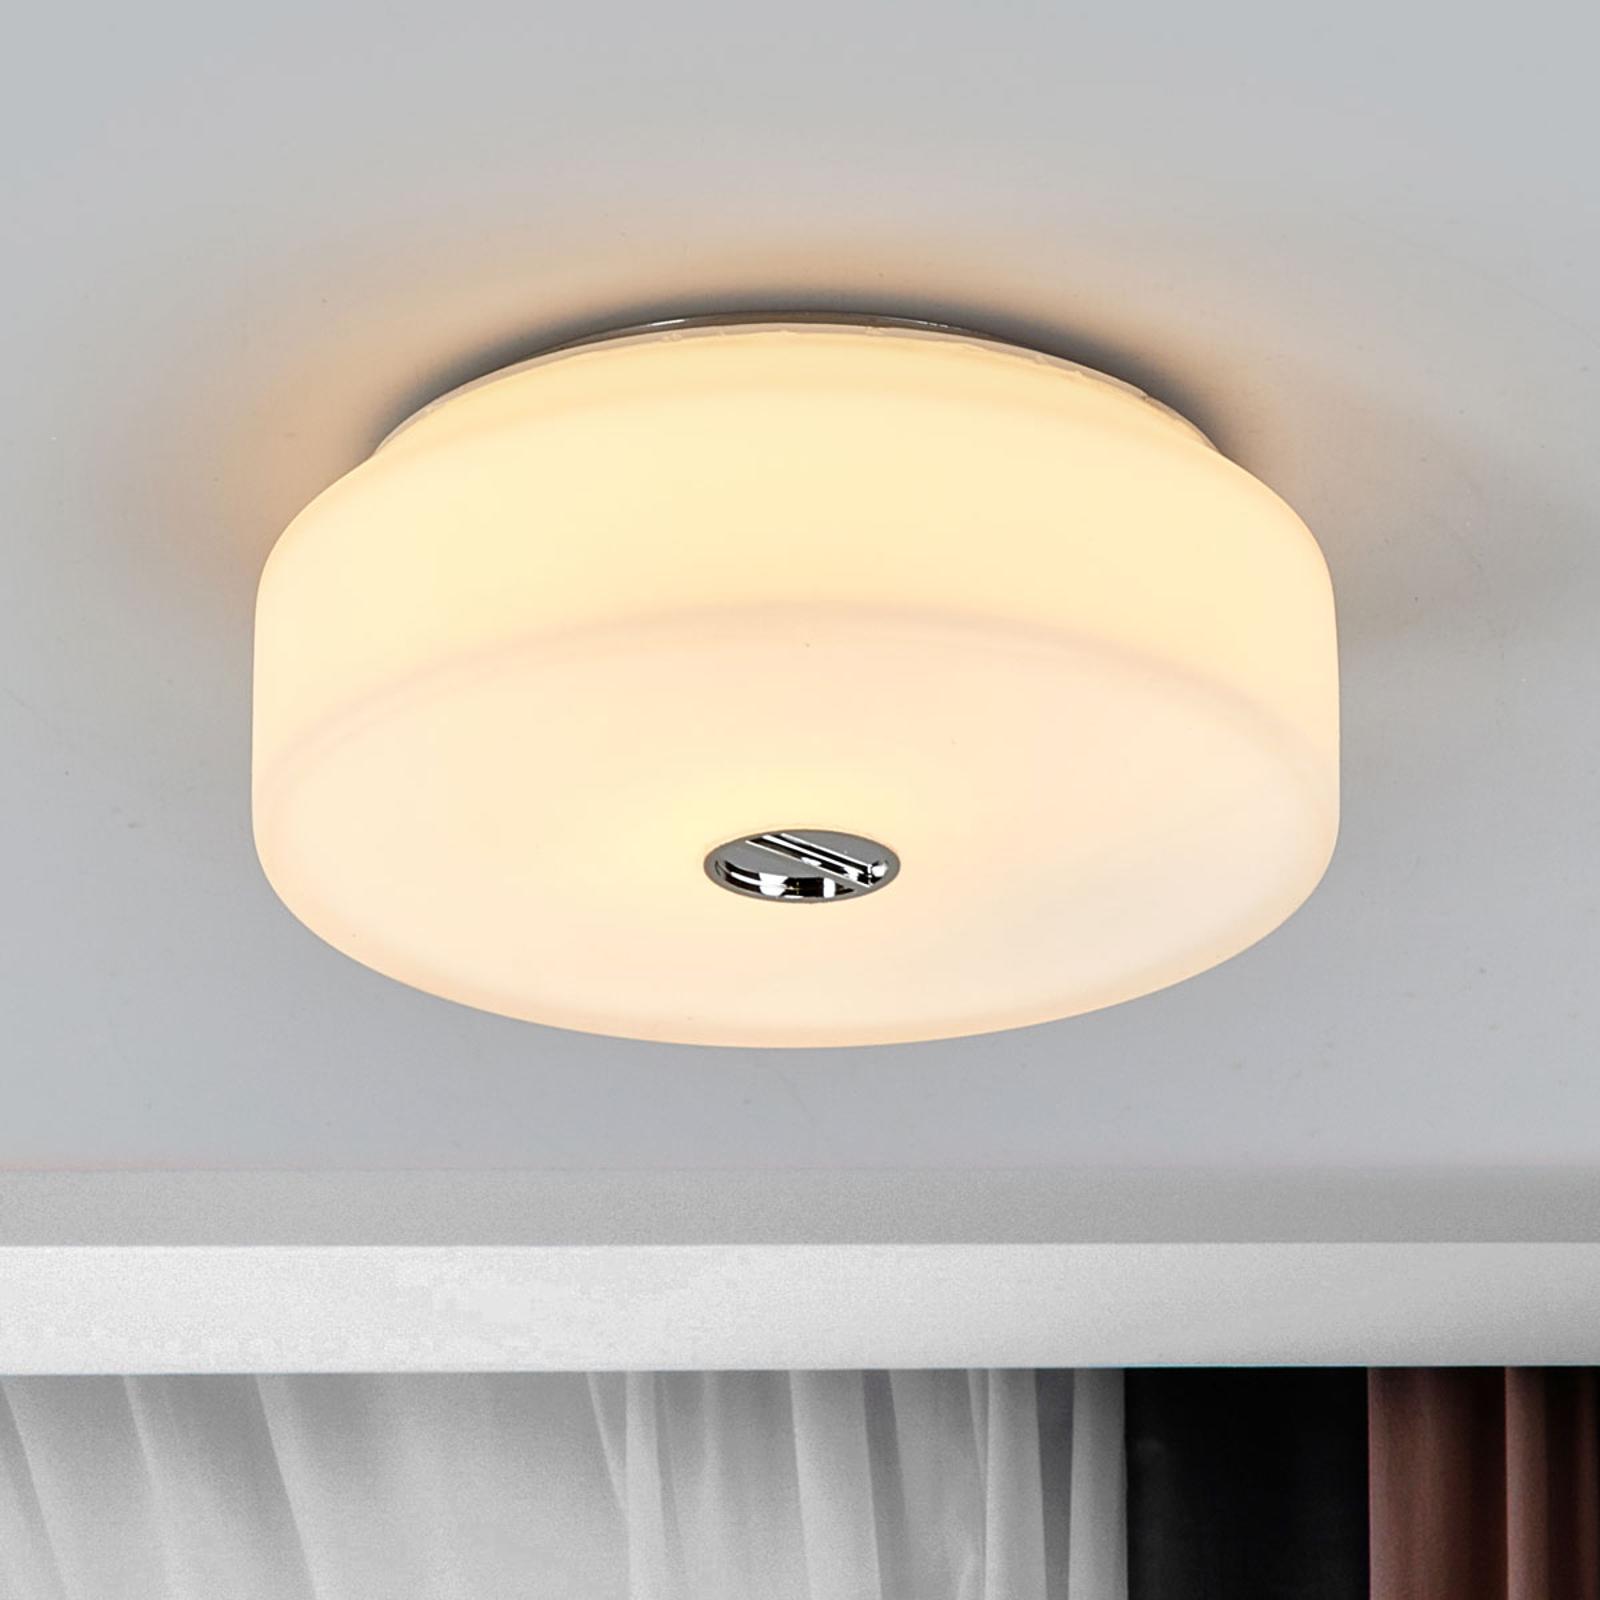 MINI BUTTON - plafondlamp van FLOS